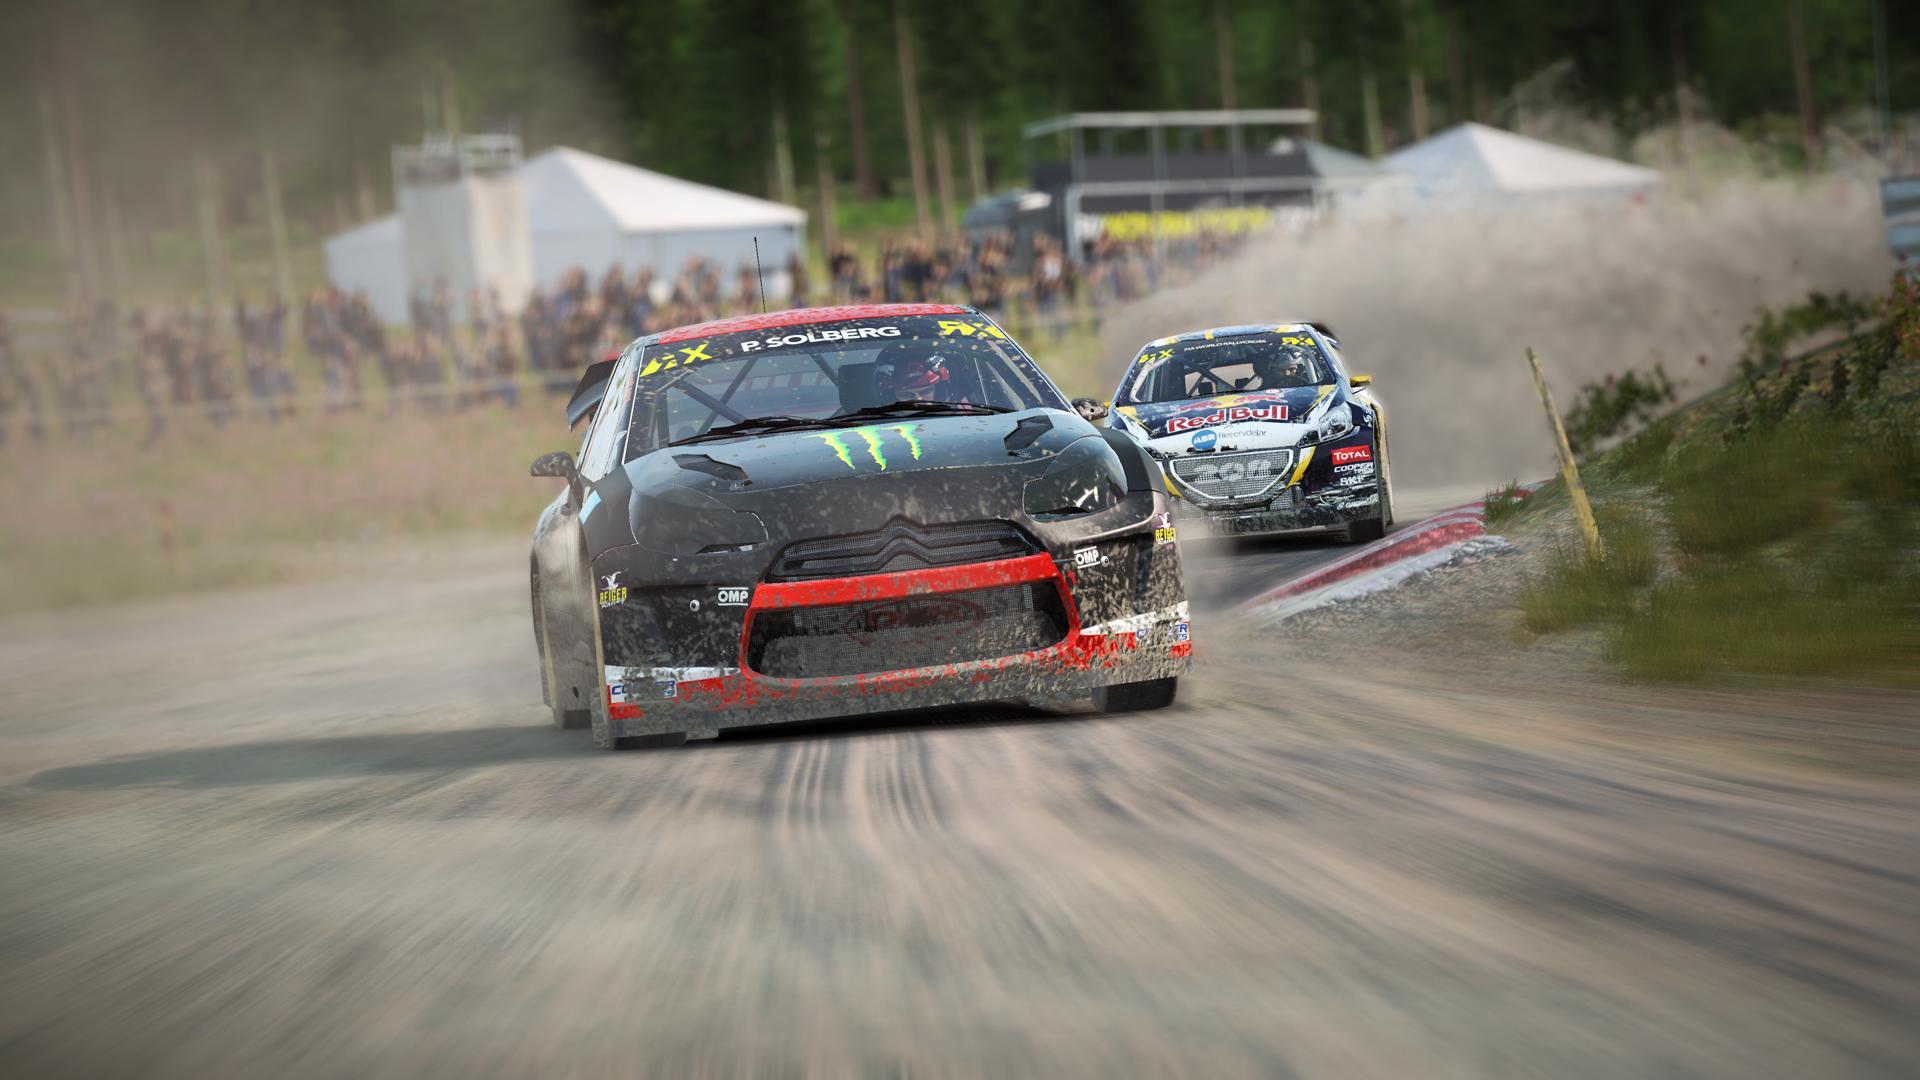 dirt 4 new screenshots and gameplay trailer 39 world rallycross 39. Black Bedroom Furniture Sets. Home Design Ideas